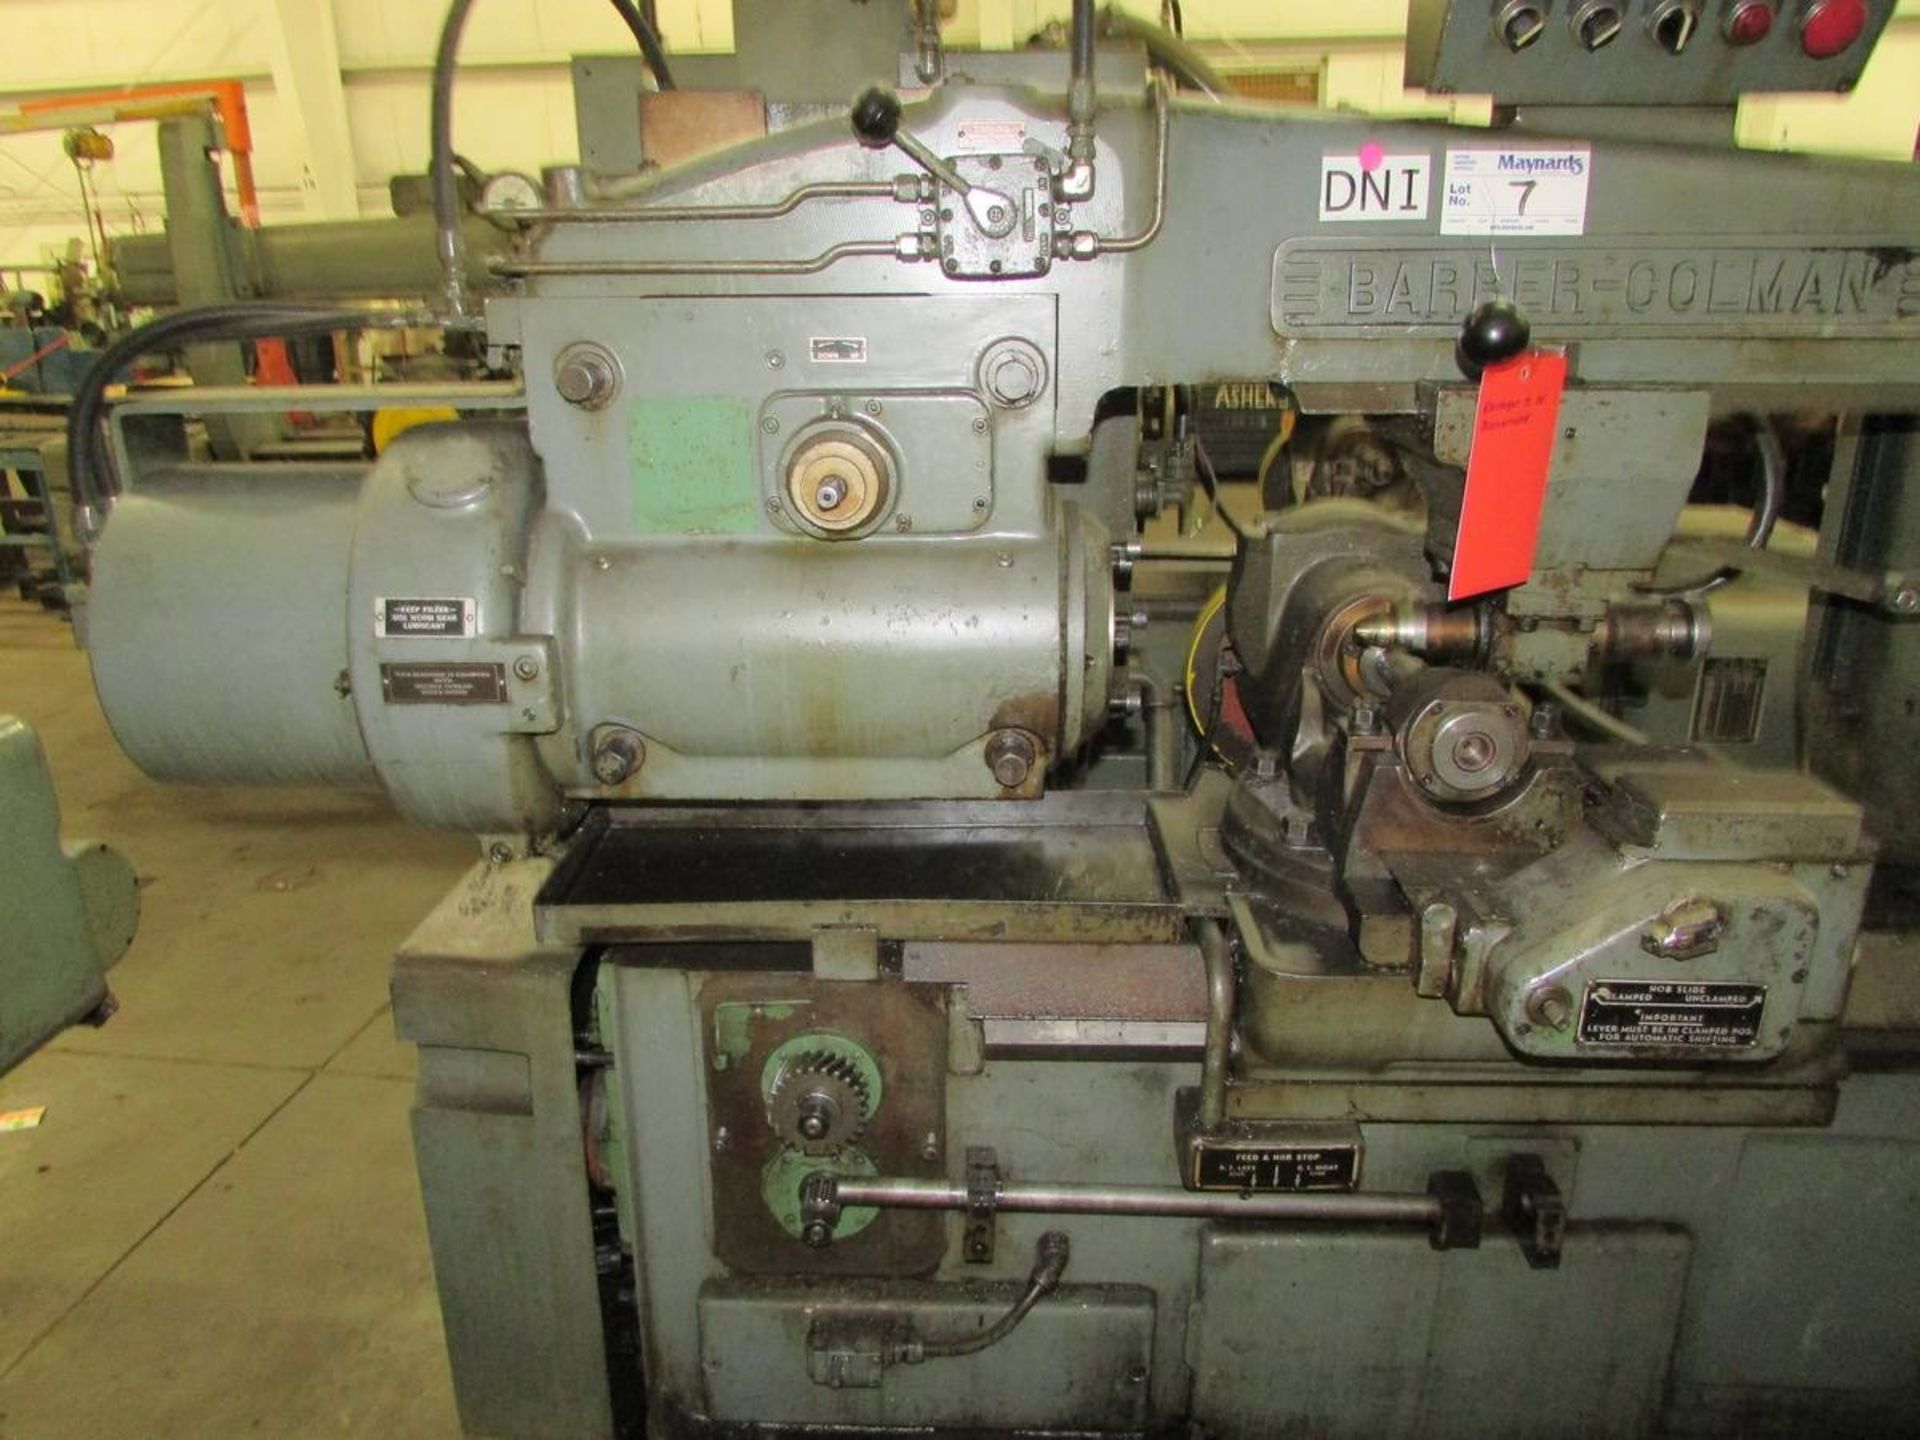 Barber Colman 16-16 Gear Hobbing Machine - Image 3 of 24